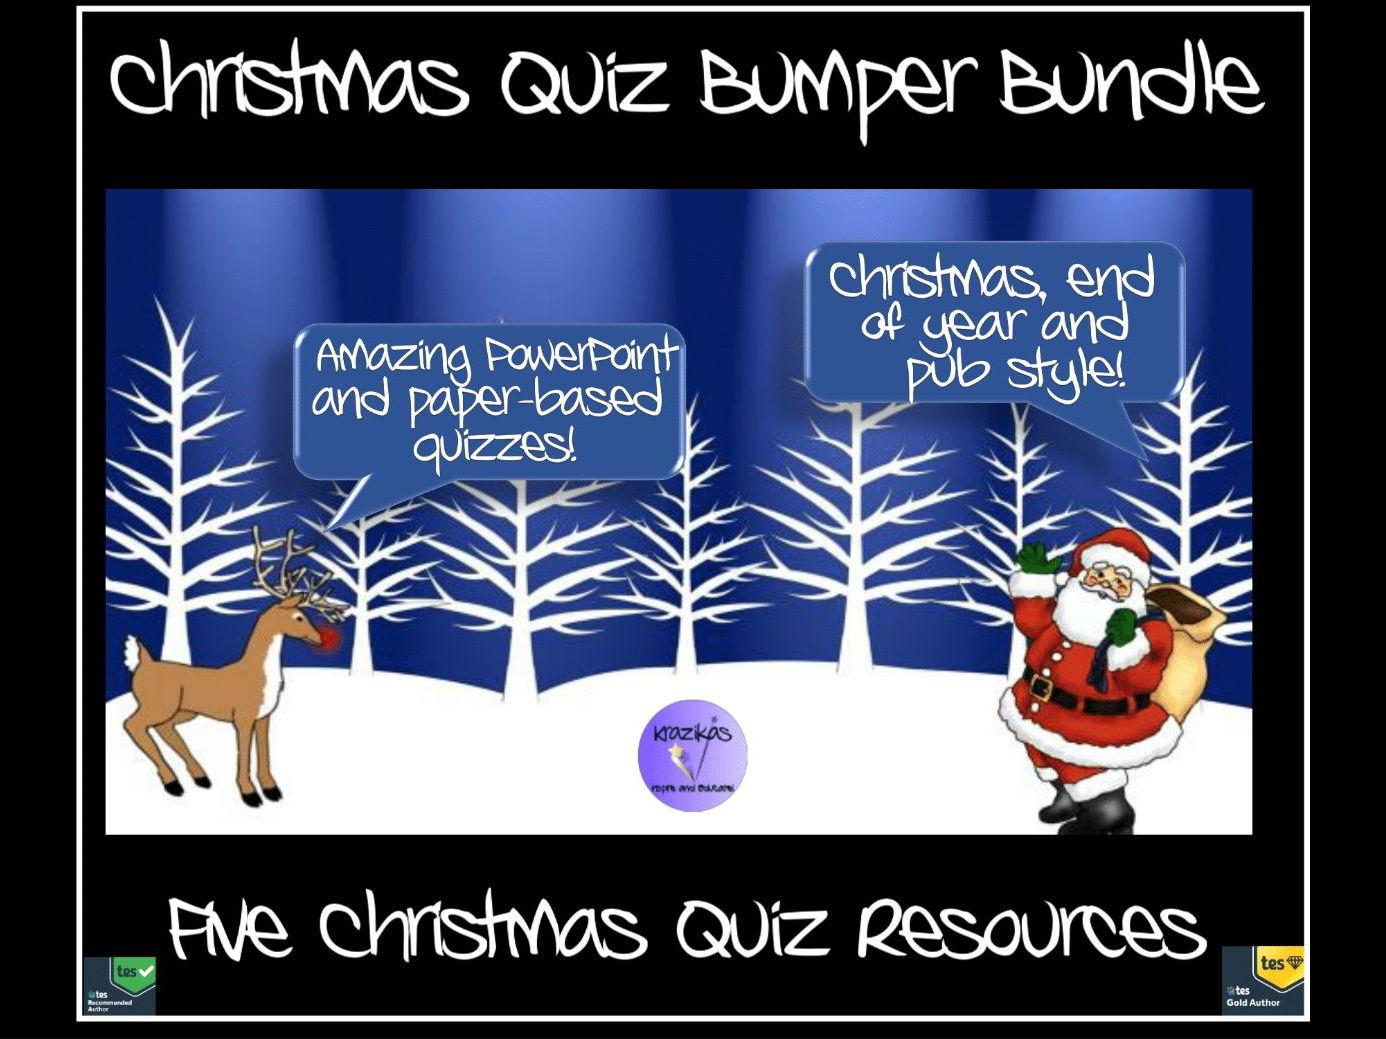 Christmas Quiz Bumper Bundle - Five Quizzes, PowerPoint and paper-based - Just £5